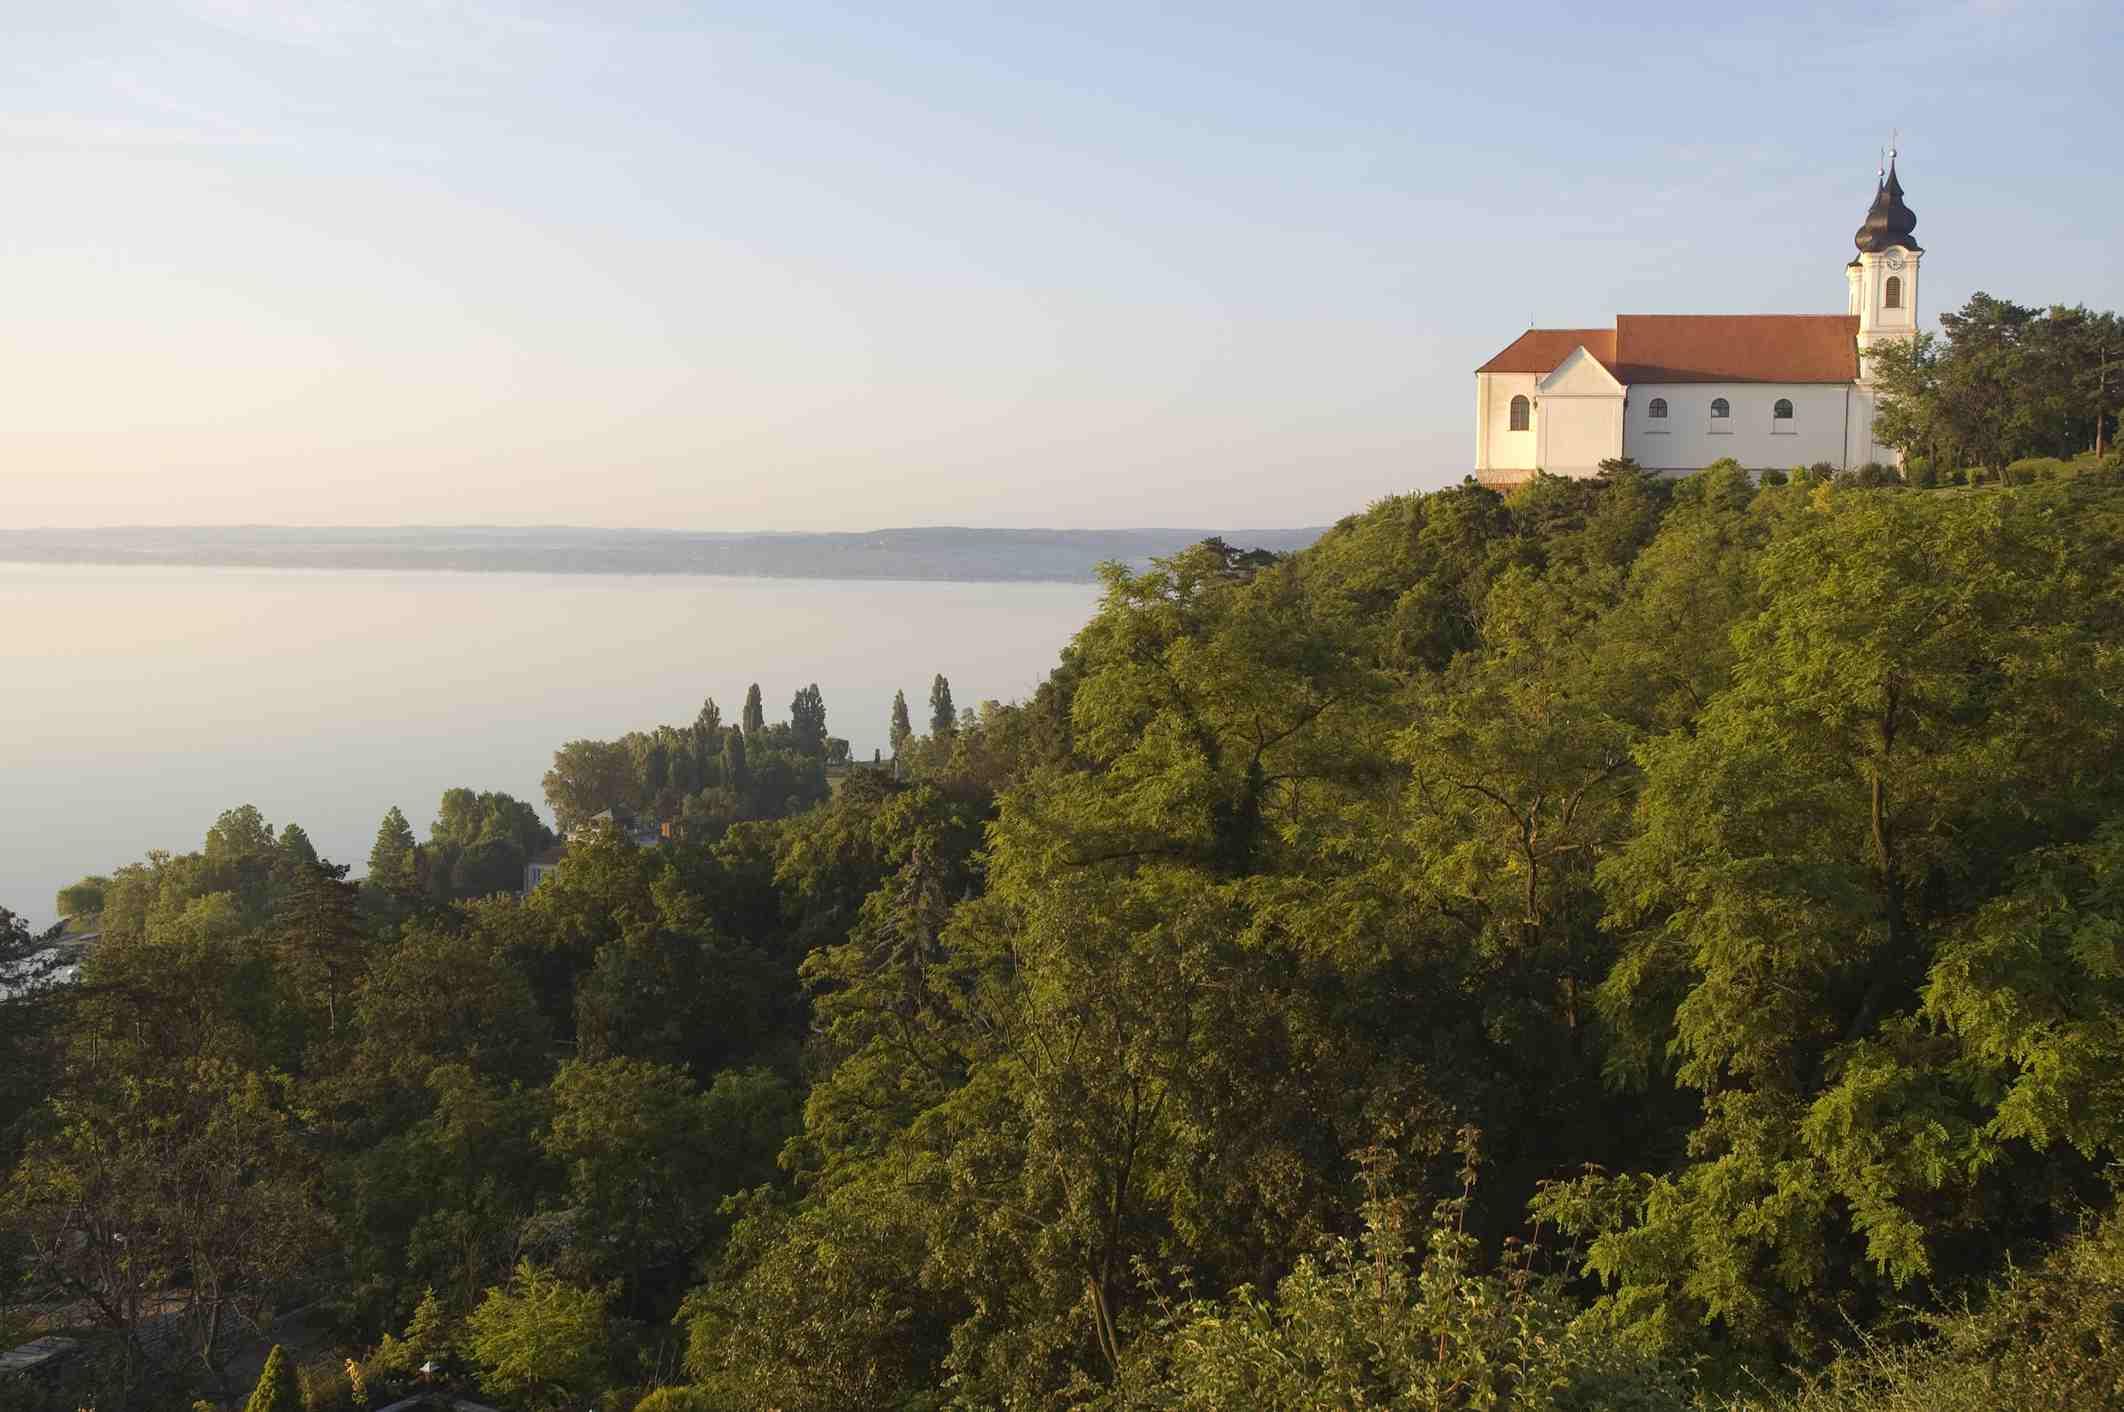 Abbey Church with twin onion-domed clocktowers overlooking Lake Balaton.